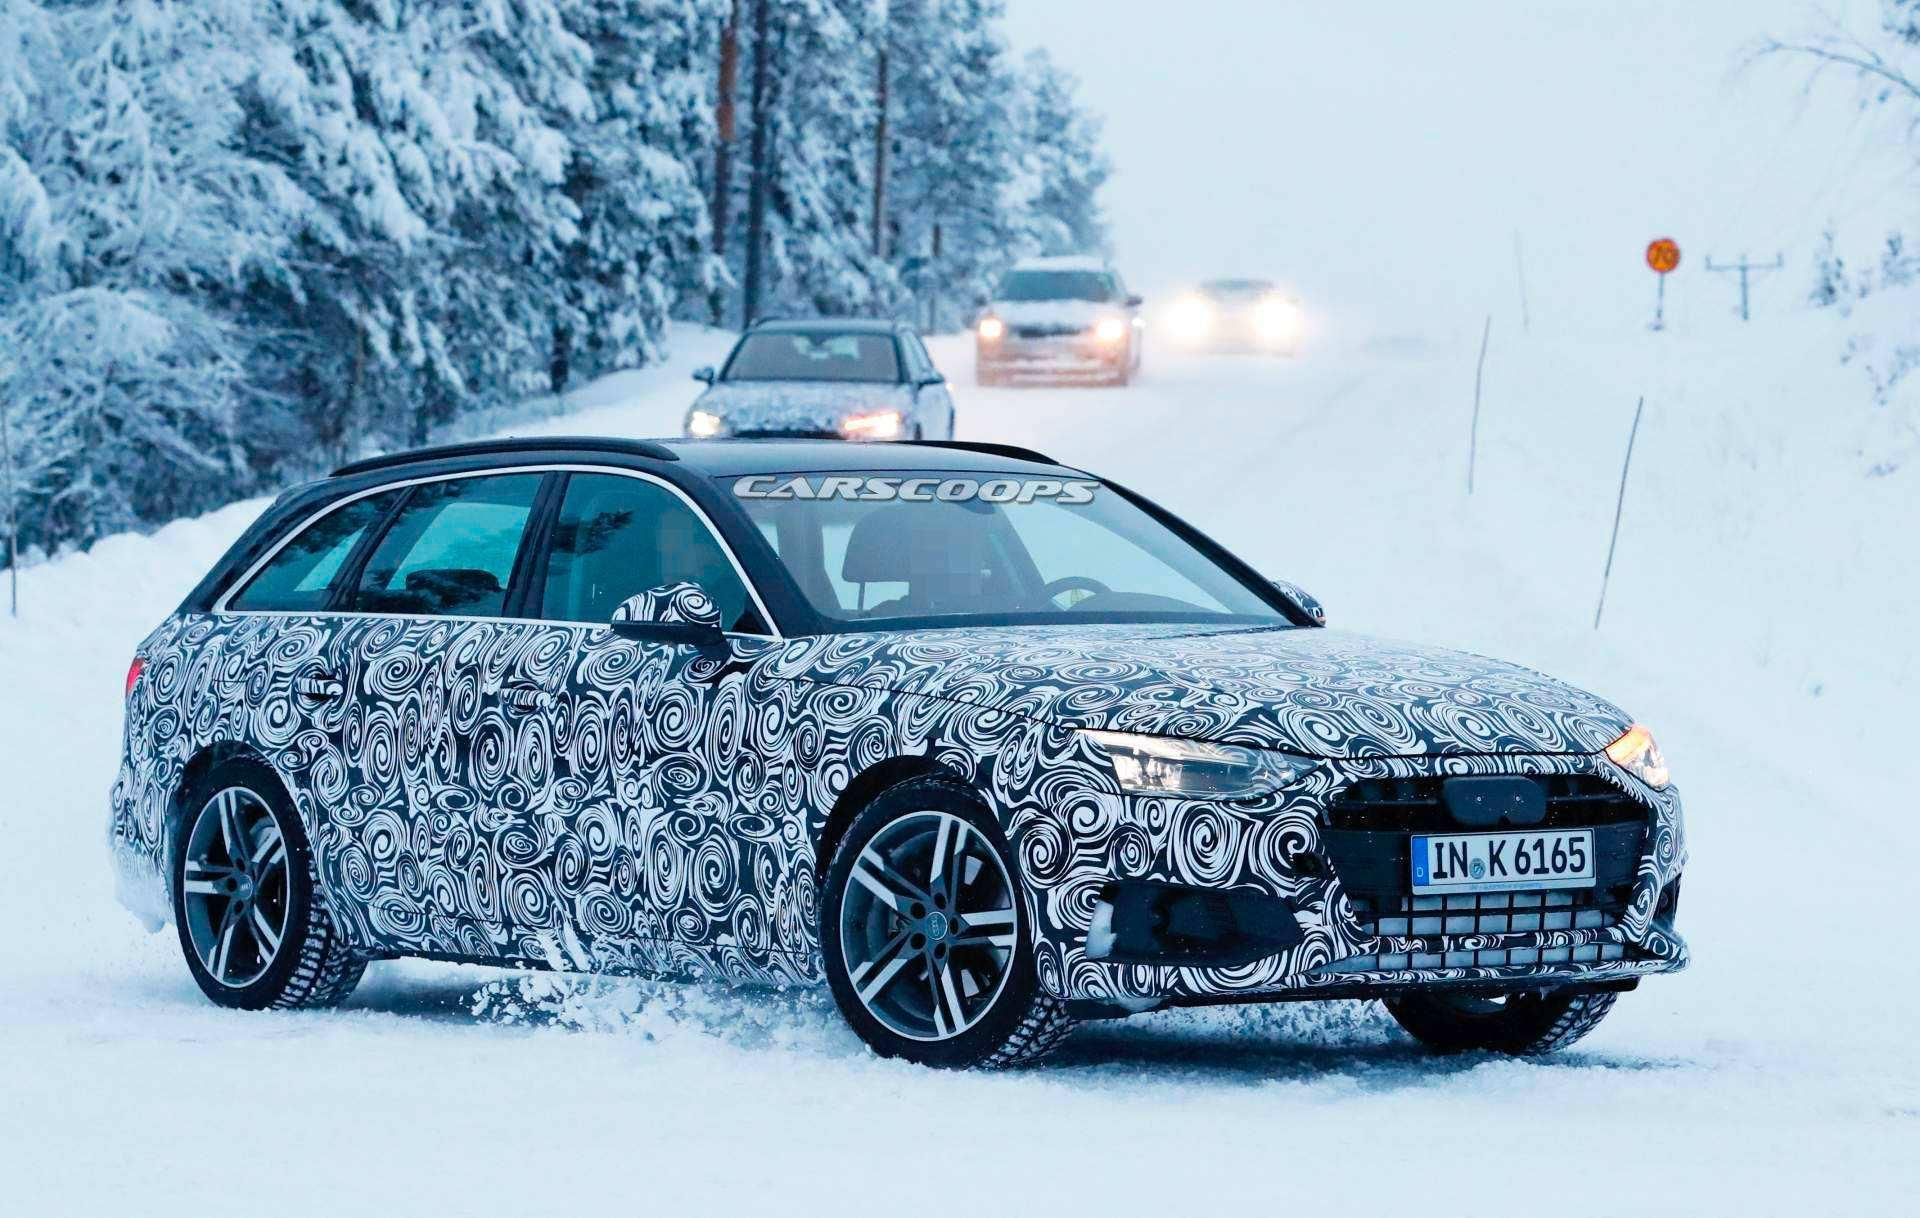 99 Concept of New Audi A4 2020 Interior Configurations for New Audi A4 2020 Interior